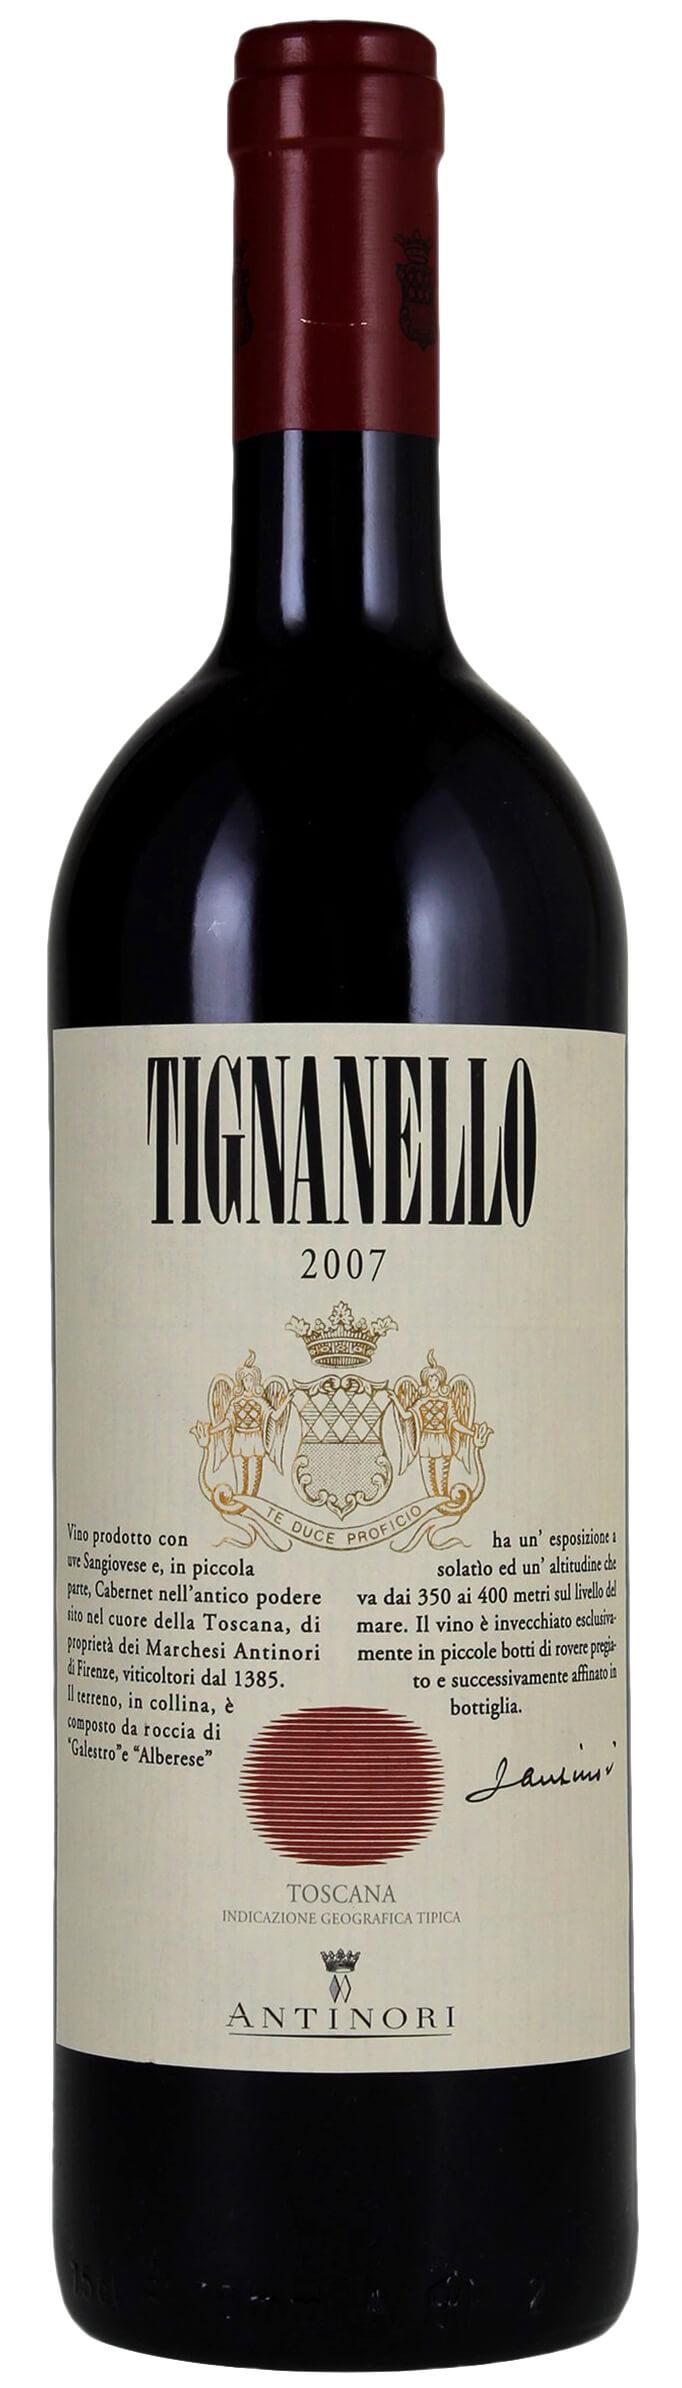 2007 Tignanello Toscana 1.5 liter фото